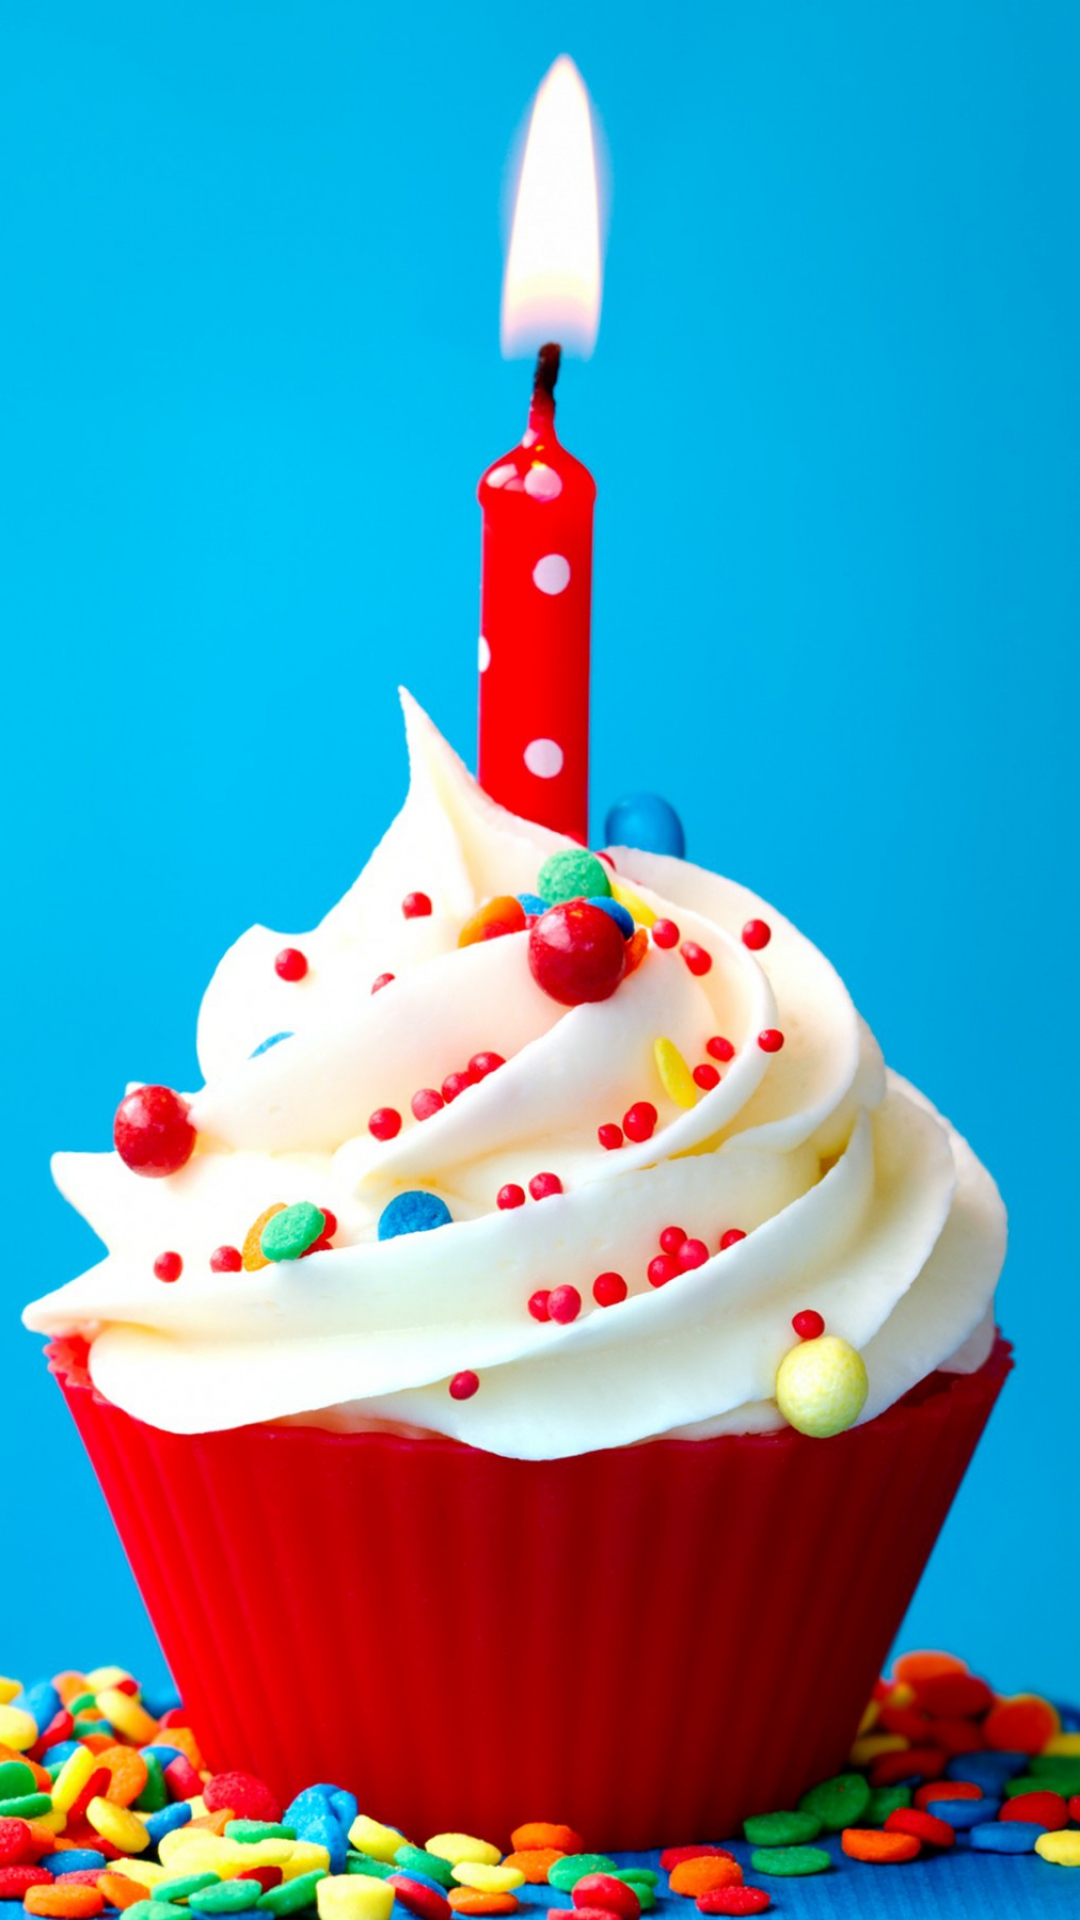 Birthday Cakes Wallpapers Wallpapersafari